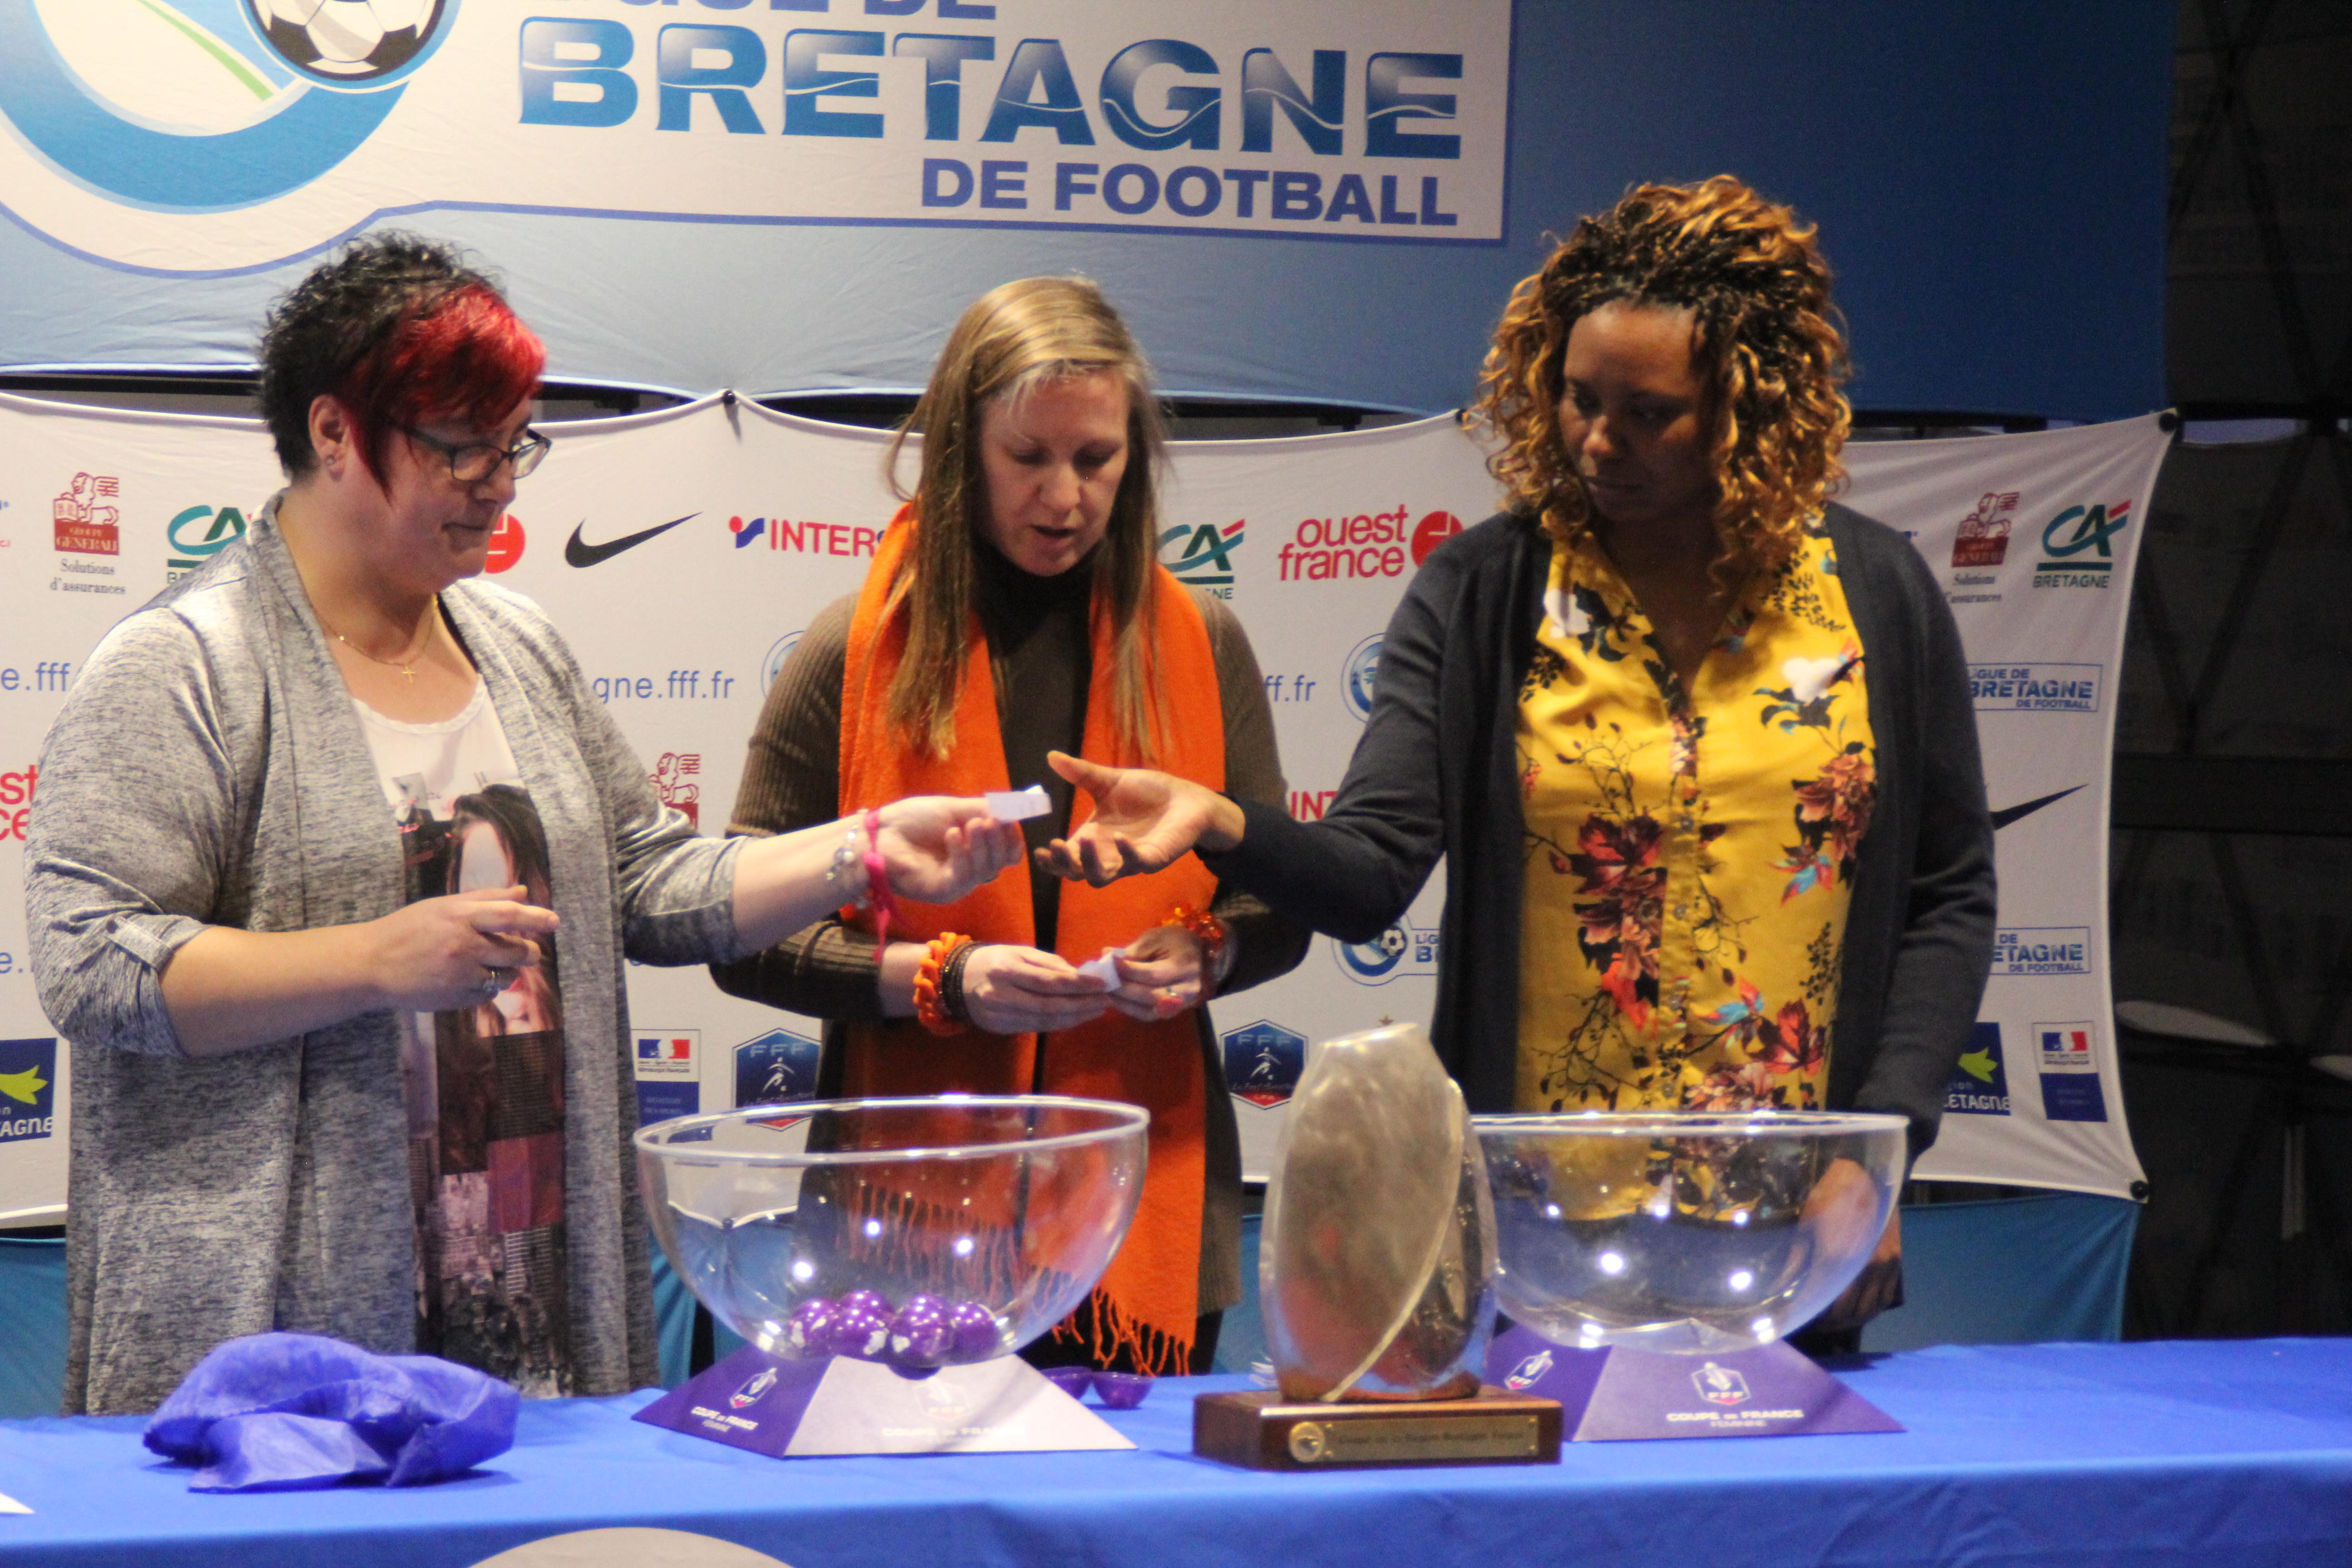 Tirage ligue bretagne de football - Tirage coupe de bretagne football ...